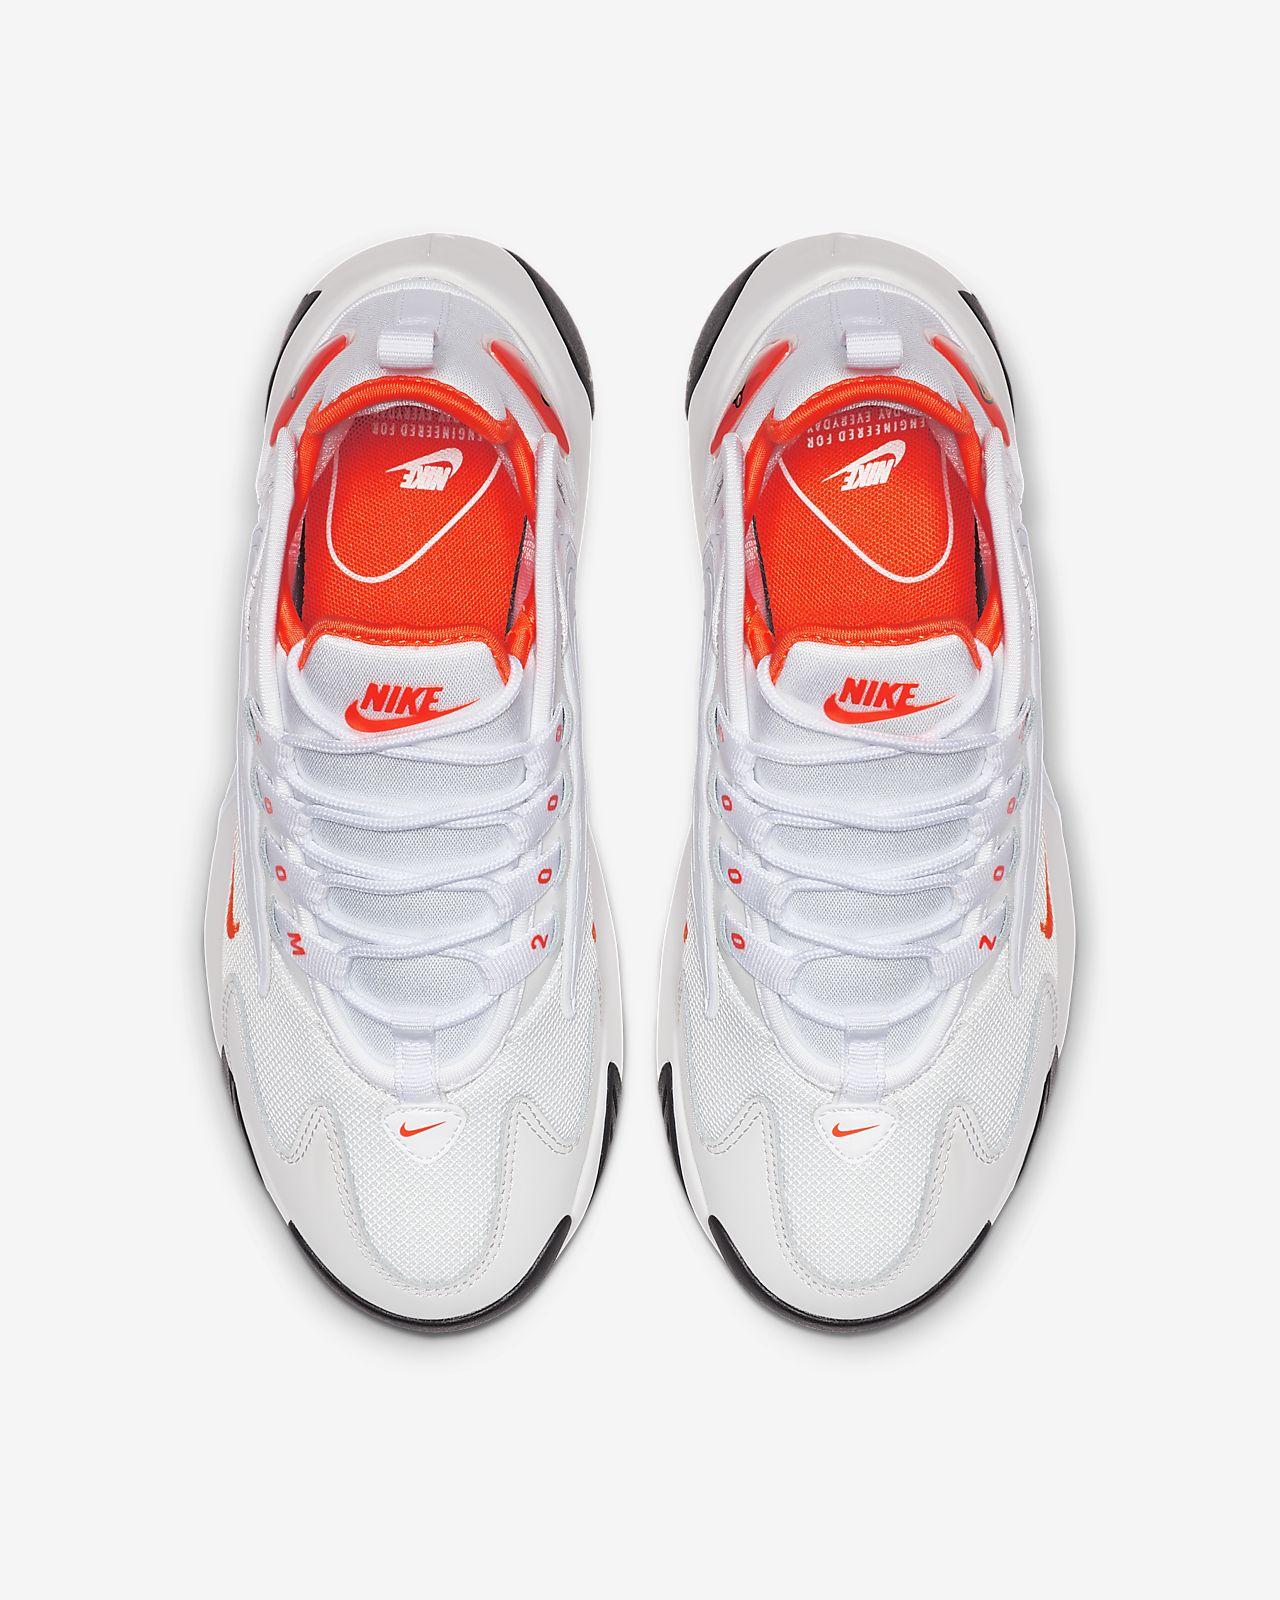 81c4c2fb63cfd Low Resolution Nike Zoom 2K Damenschuh Nike Zoom 2K Damenschuh